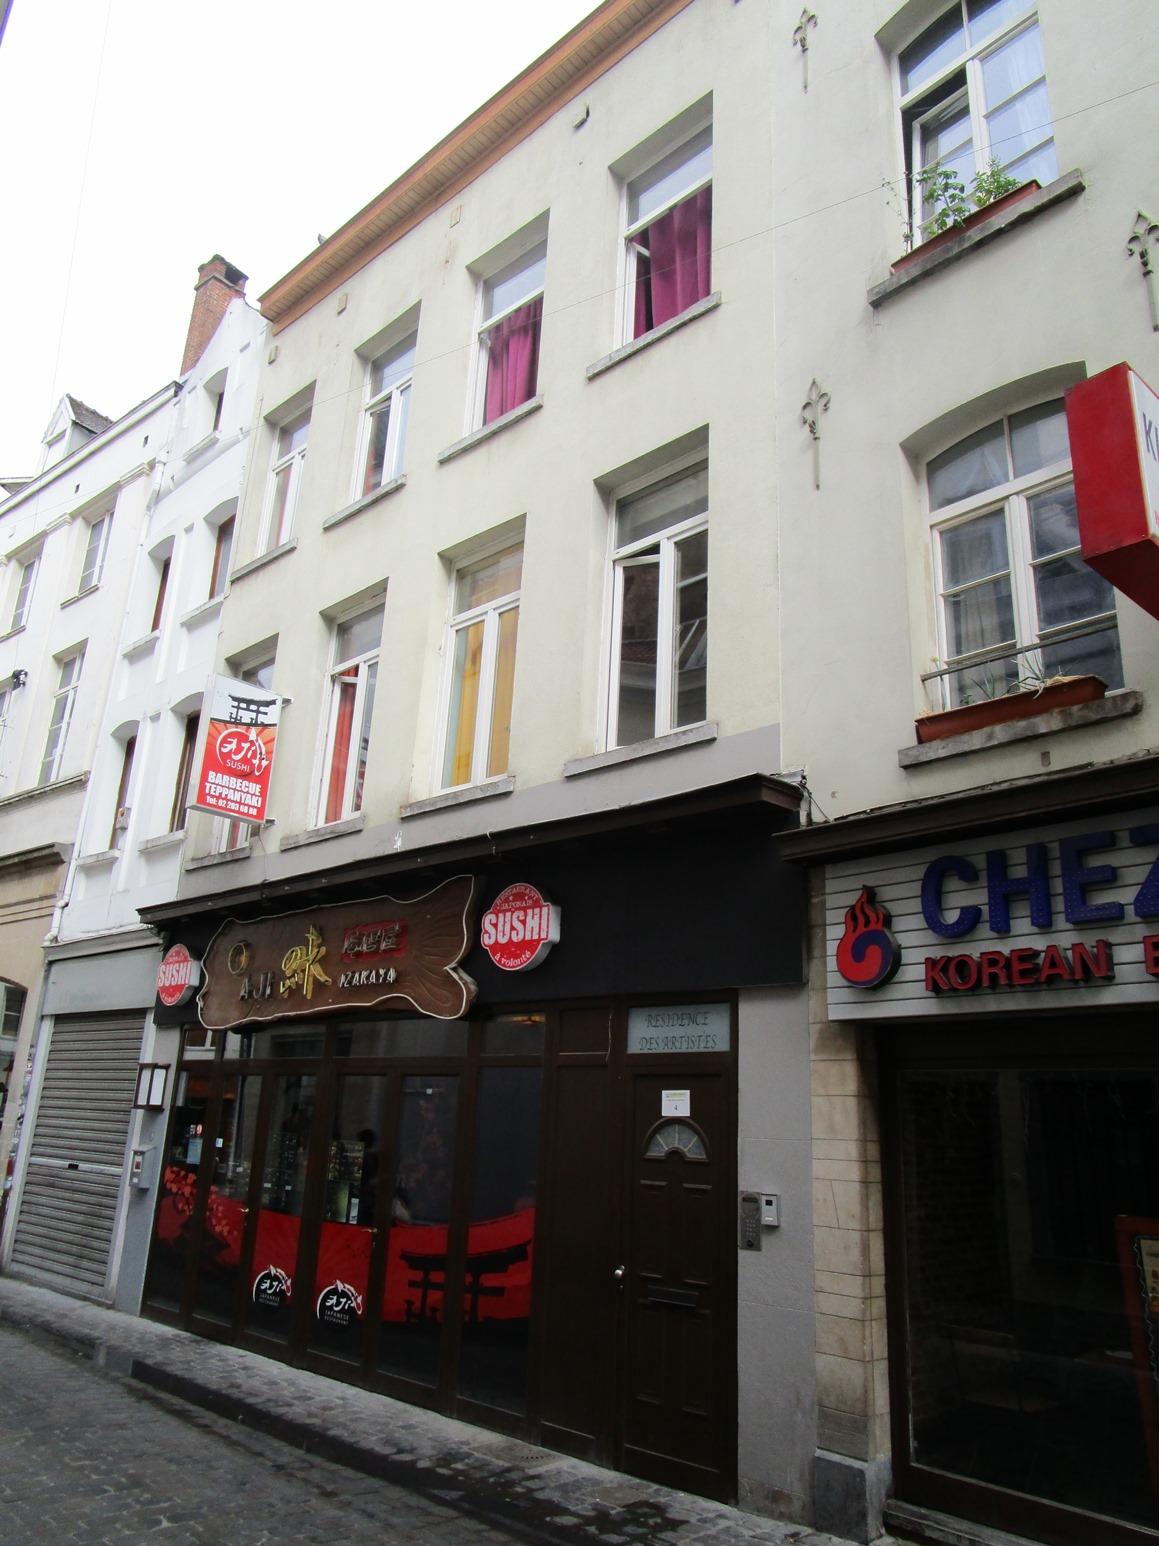 Greepstraat 4, 2015